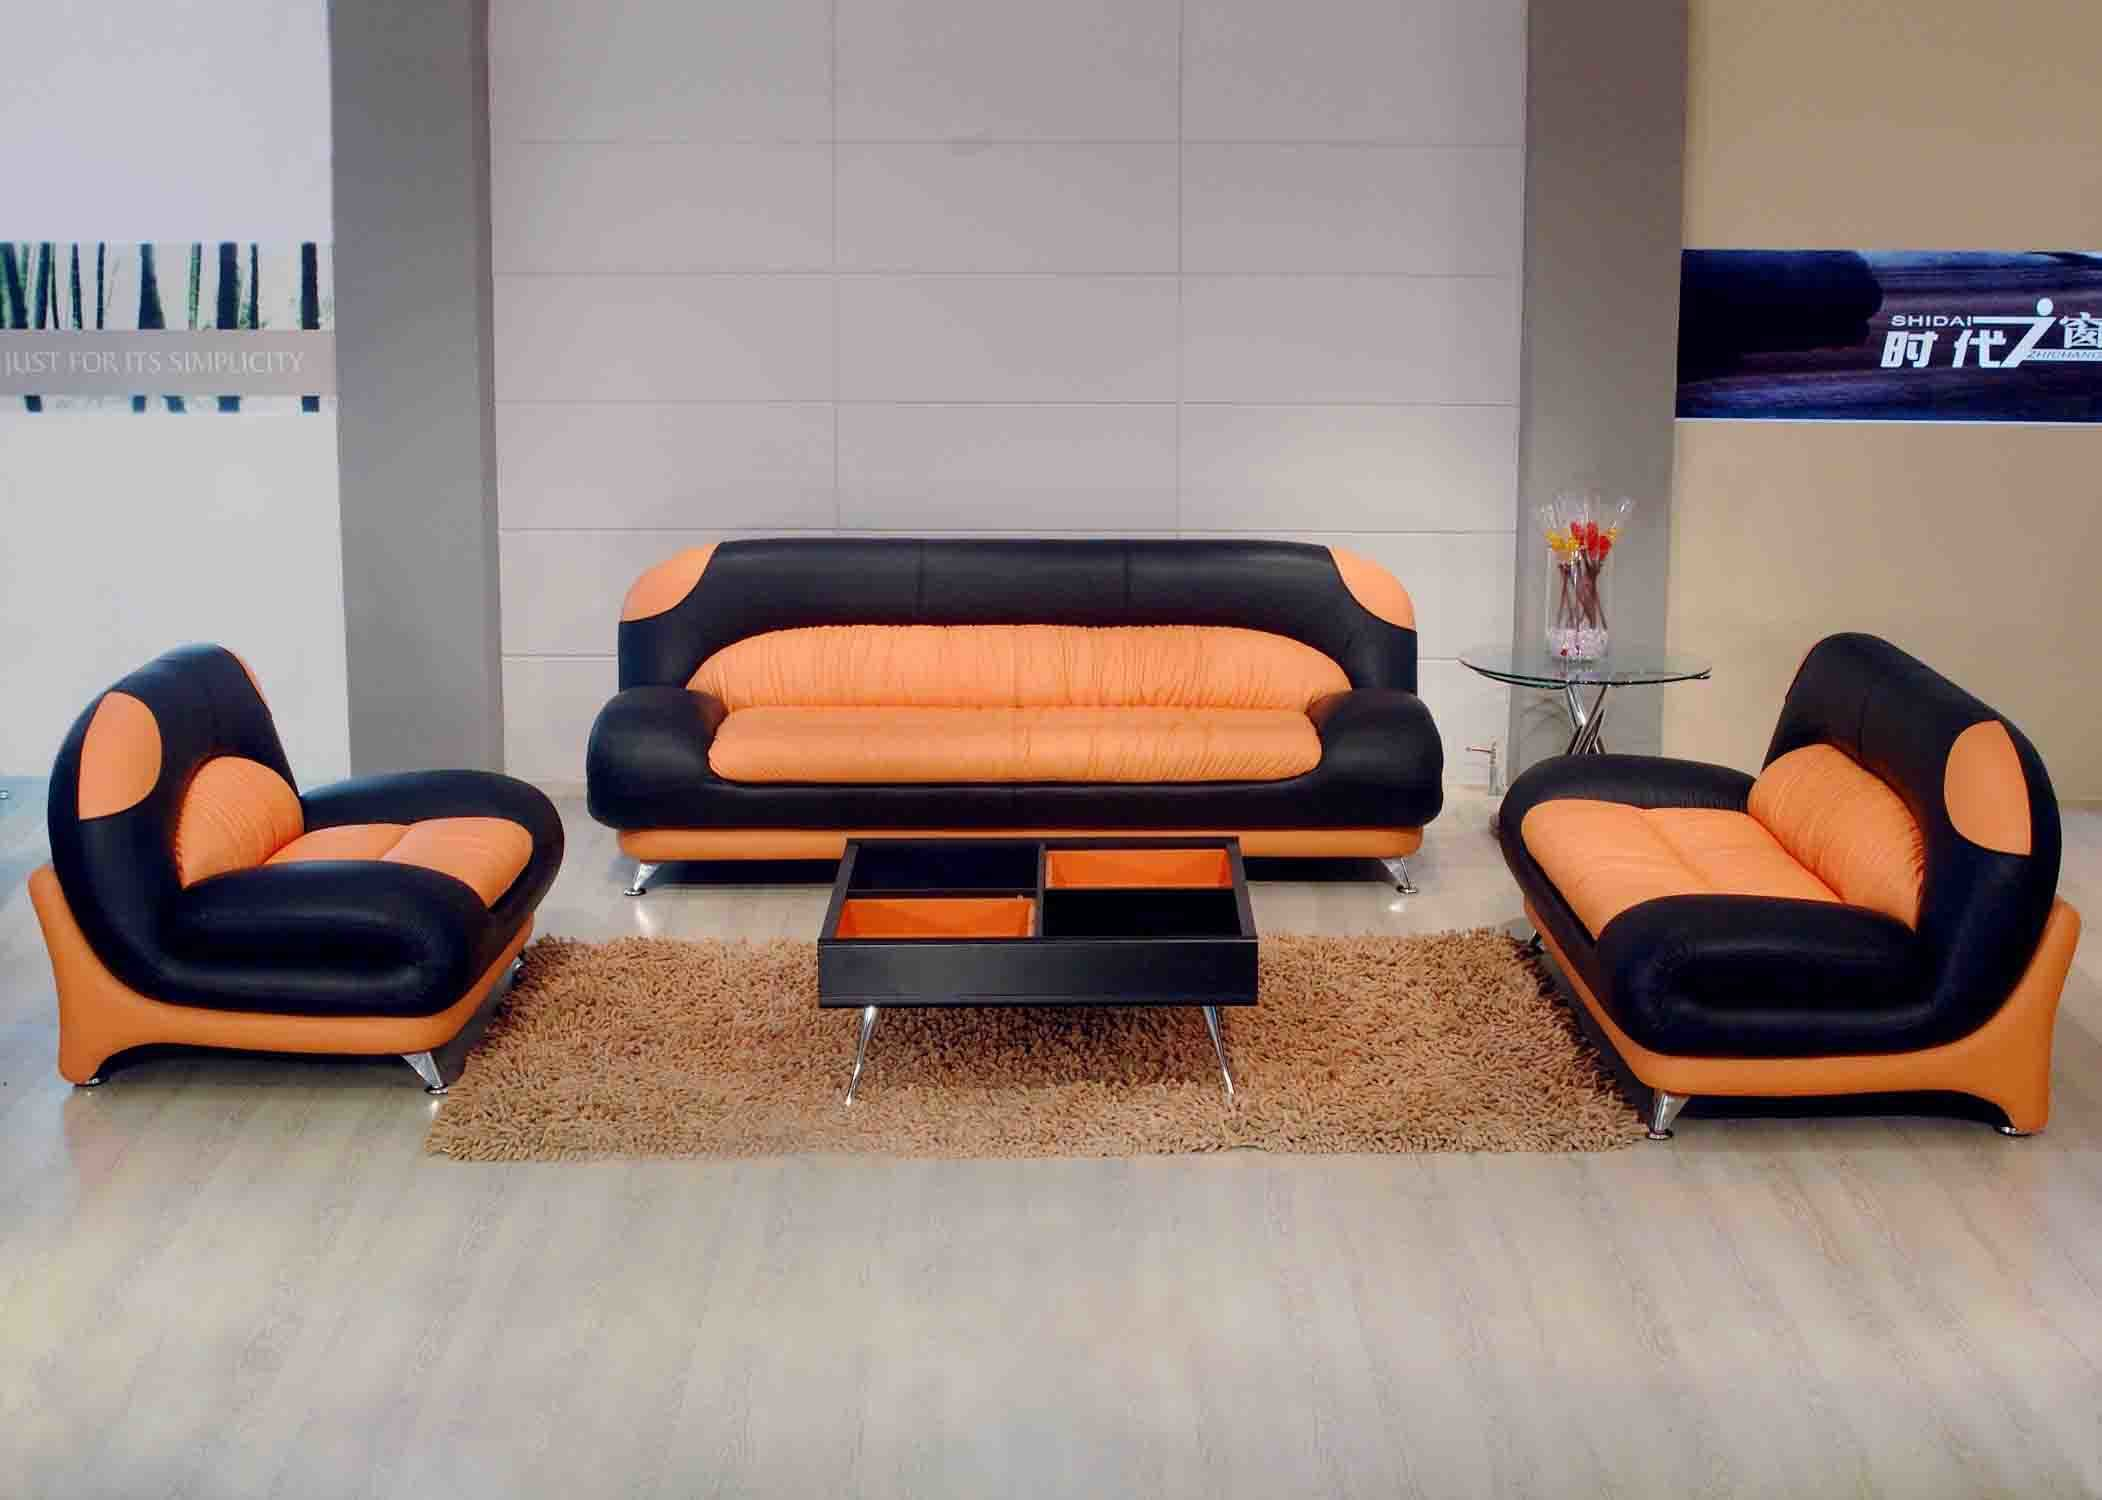 Replacement Cushions For Ashley Furniture Couch picture on nailhead trim sofa ashley furniture with Replacement Cushions For Ashley Furniture Couch, sofa e3351b7562e6b074bd6ae5049e05f59e